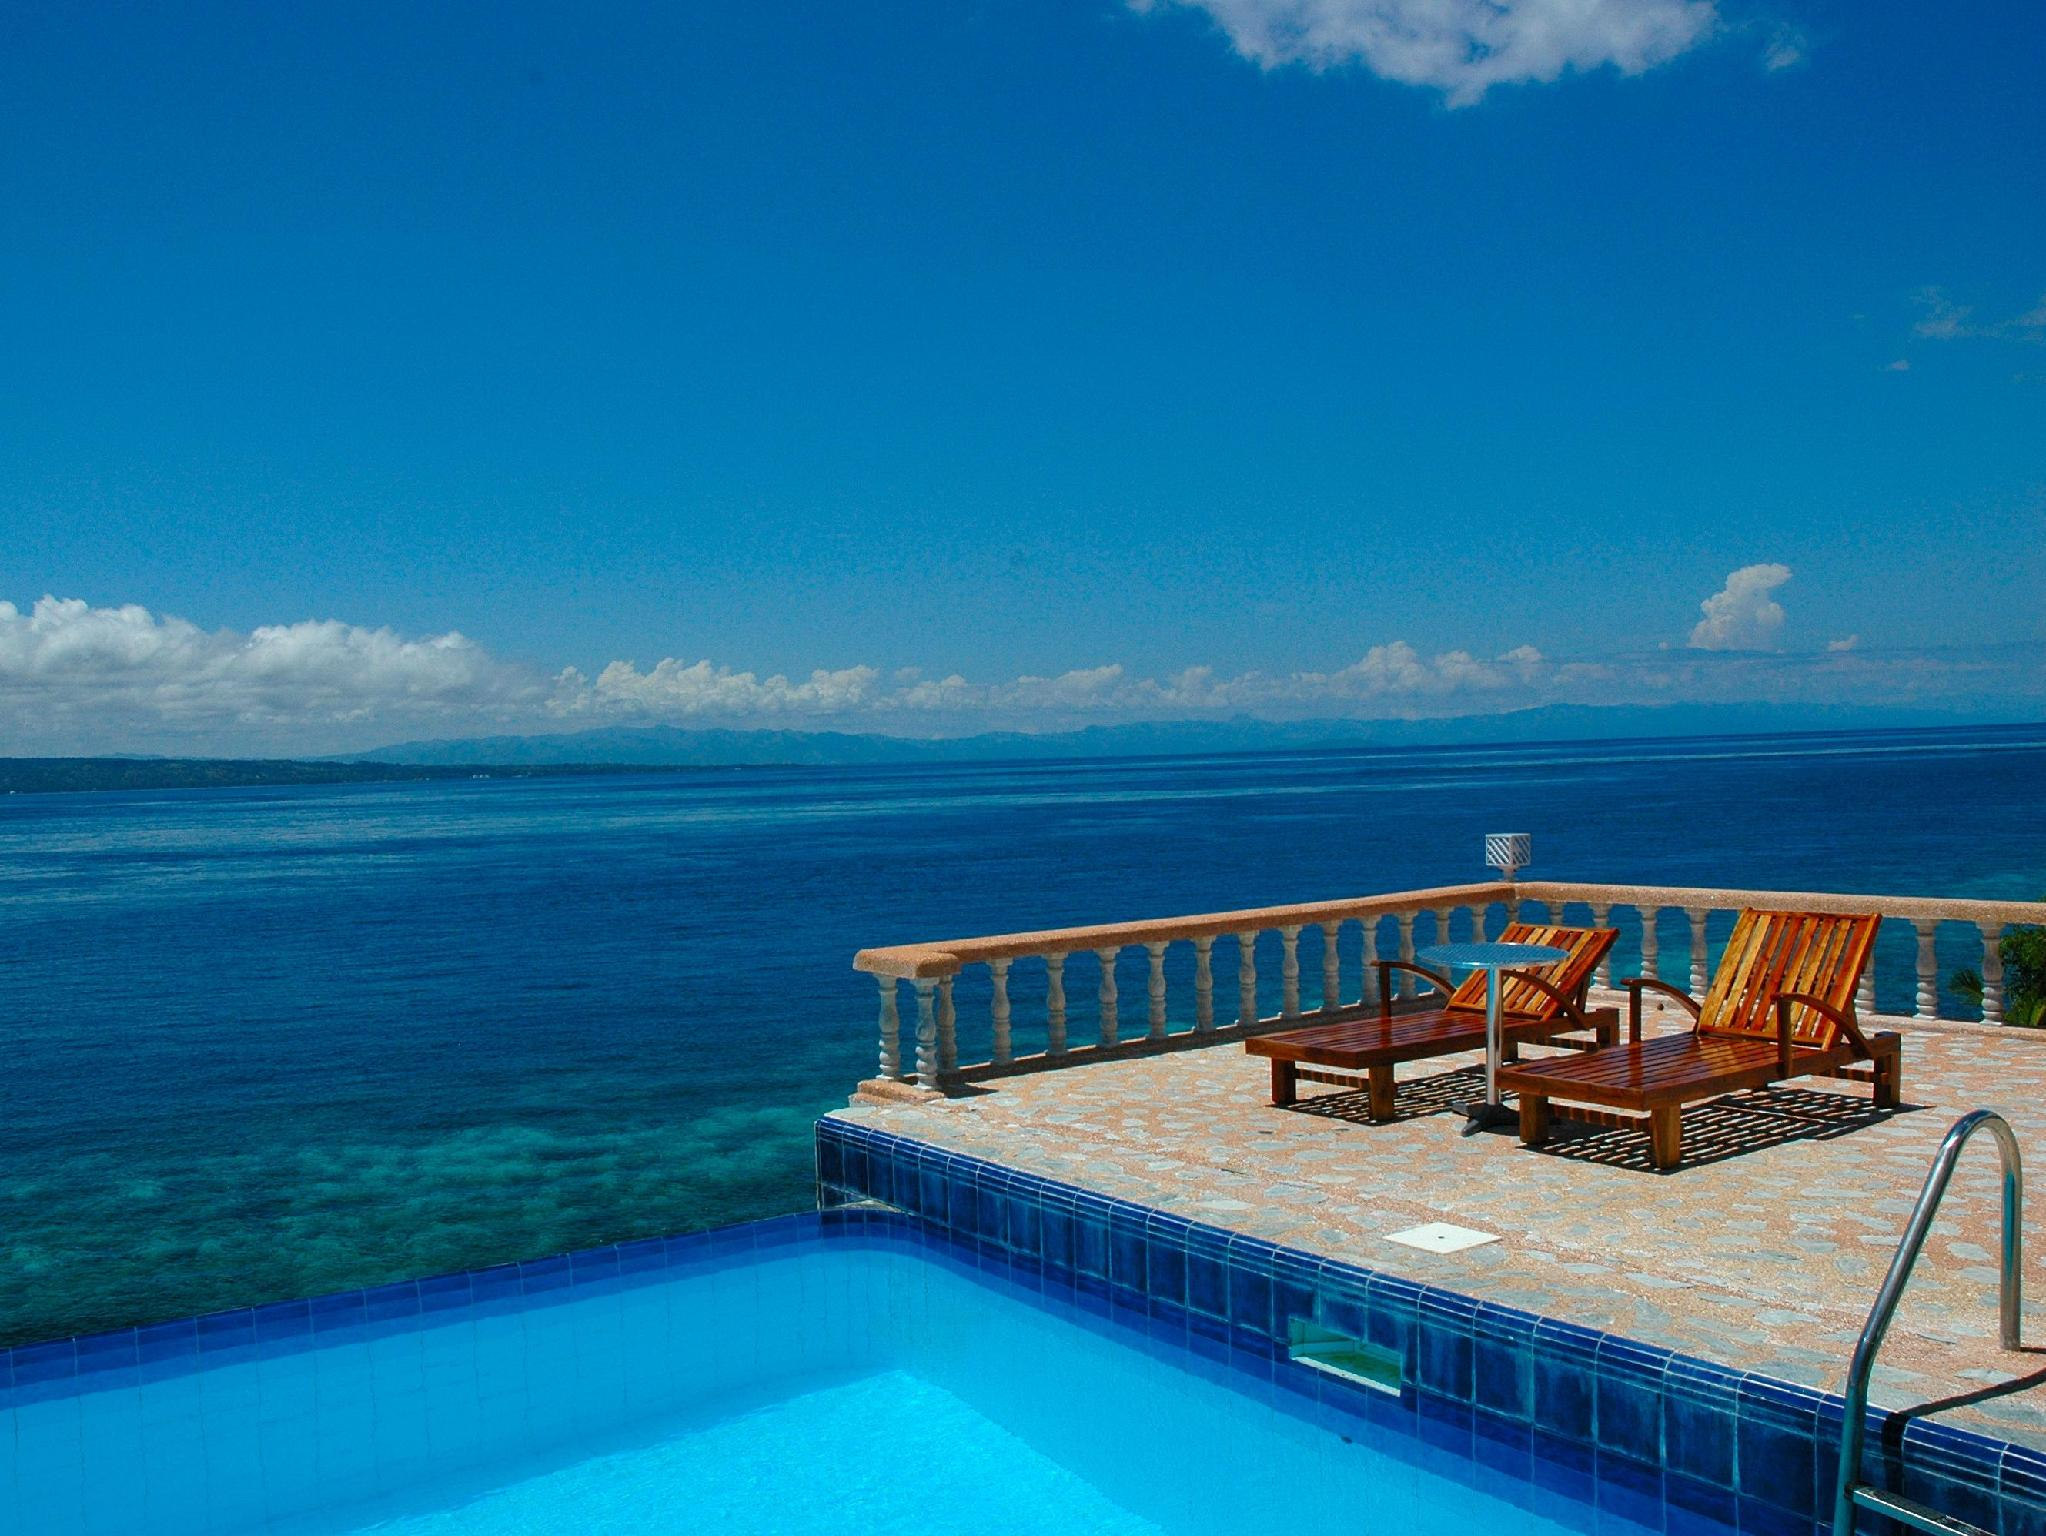 Eden Resort Santander Cebu Philippines Great Discounted Rates